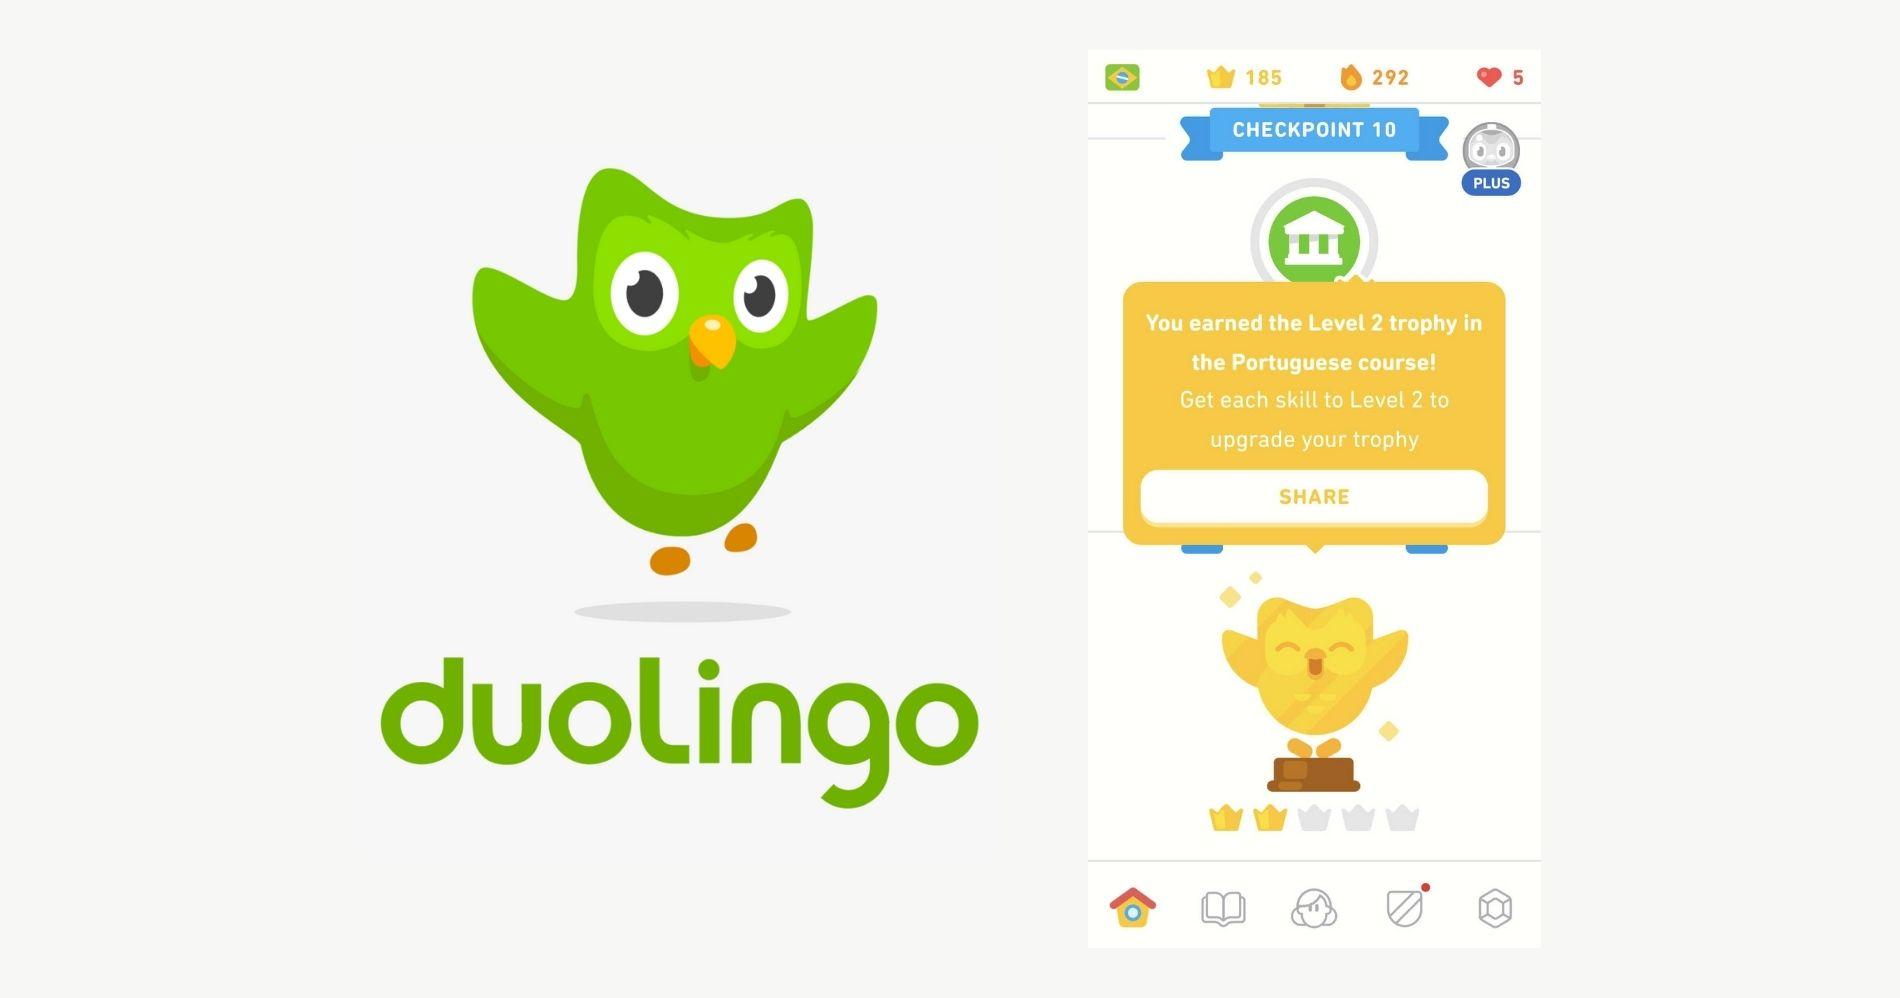 Duolingo Web Bisnis Muda - Google